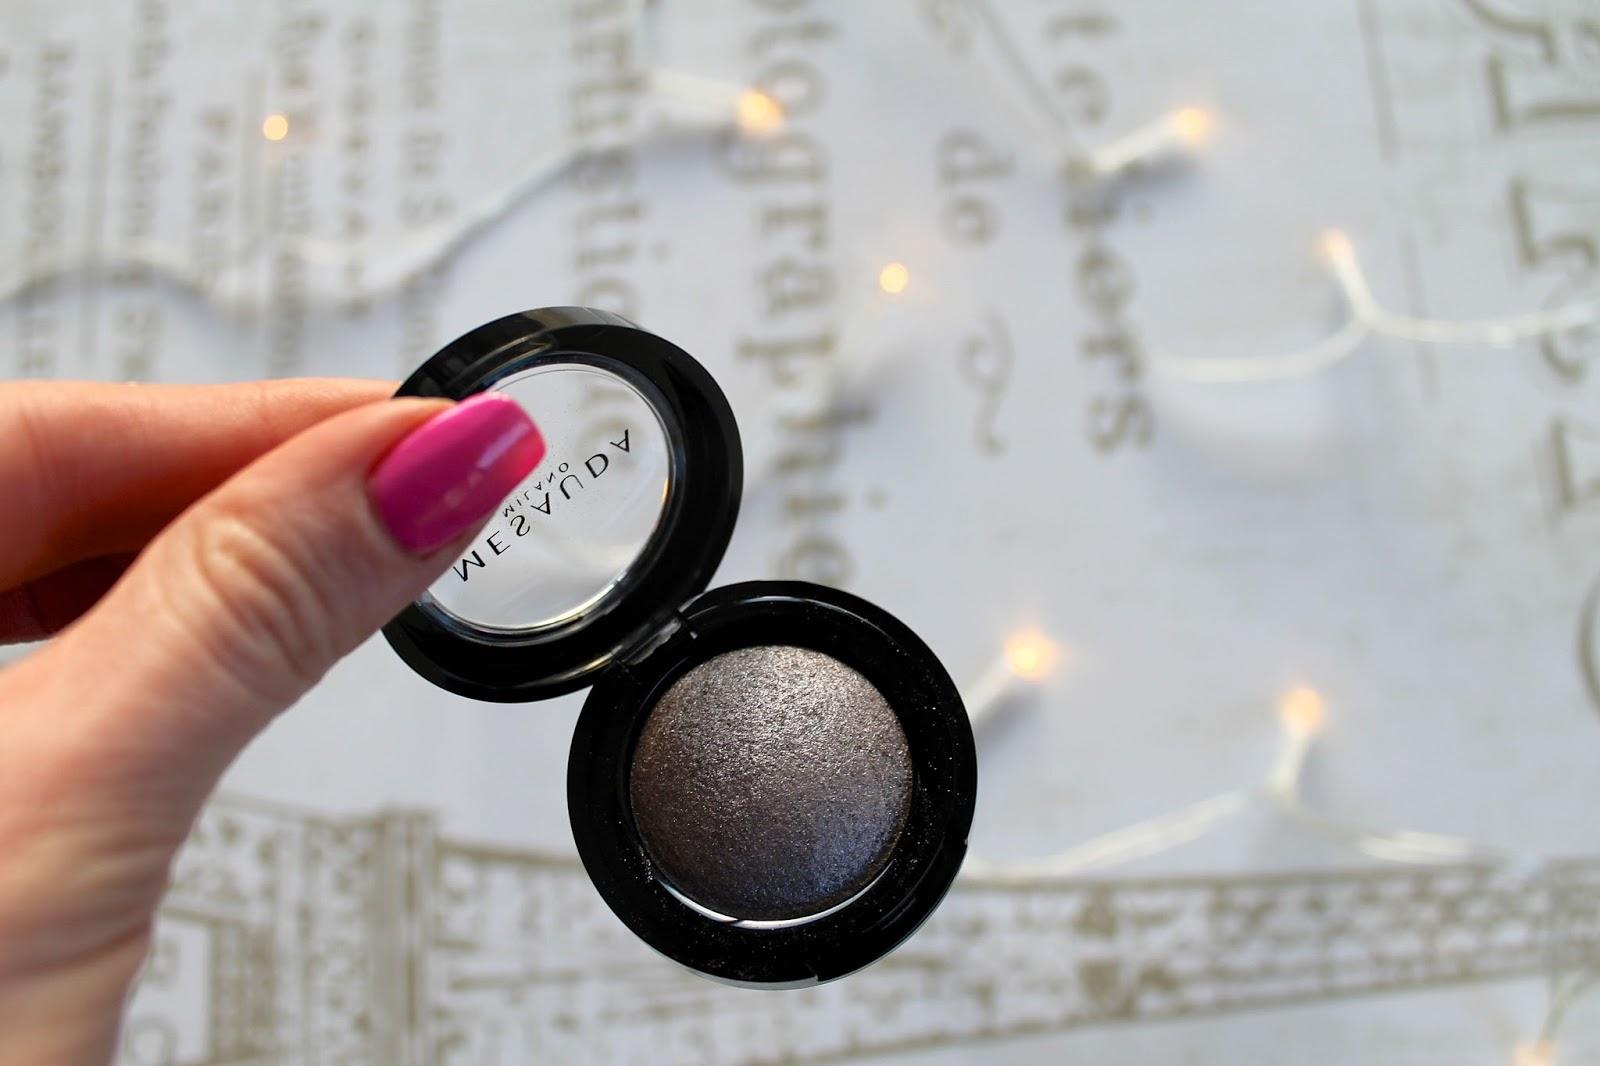 mesauda milano eyeshadow blog review